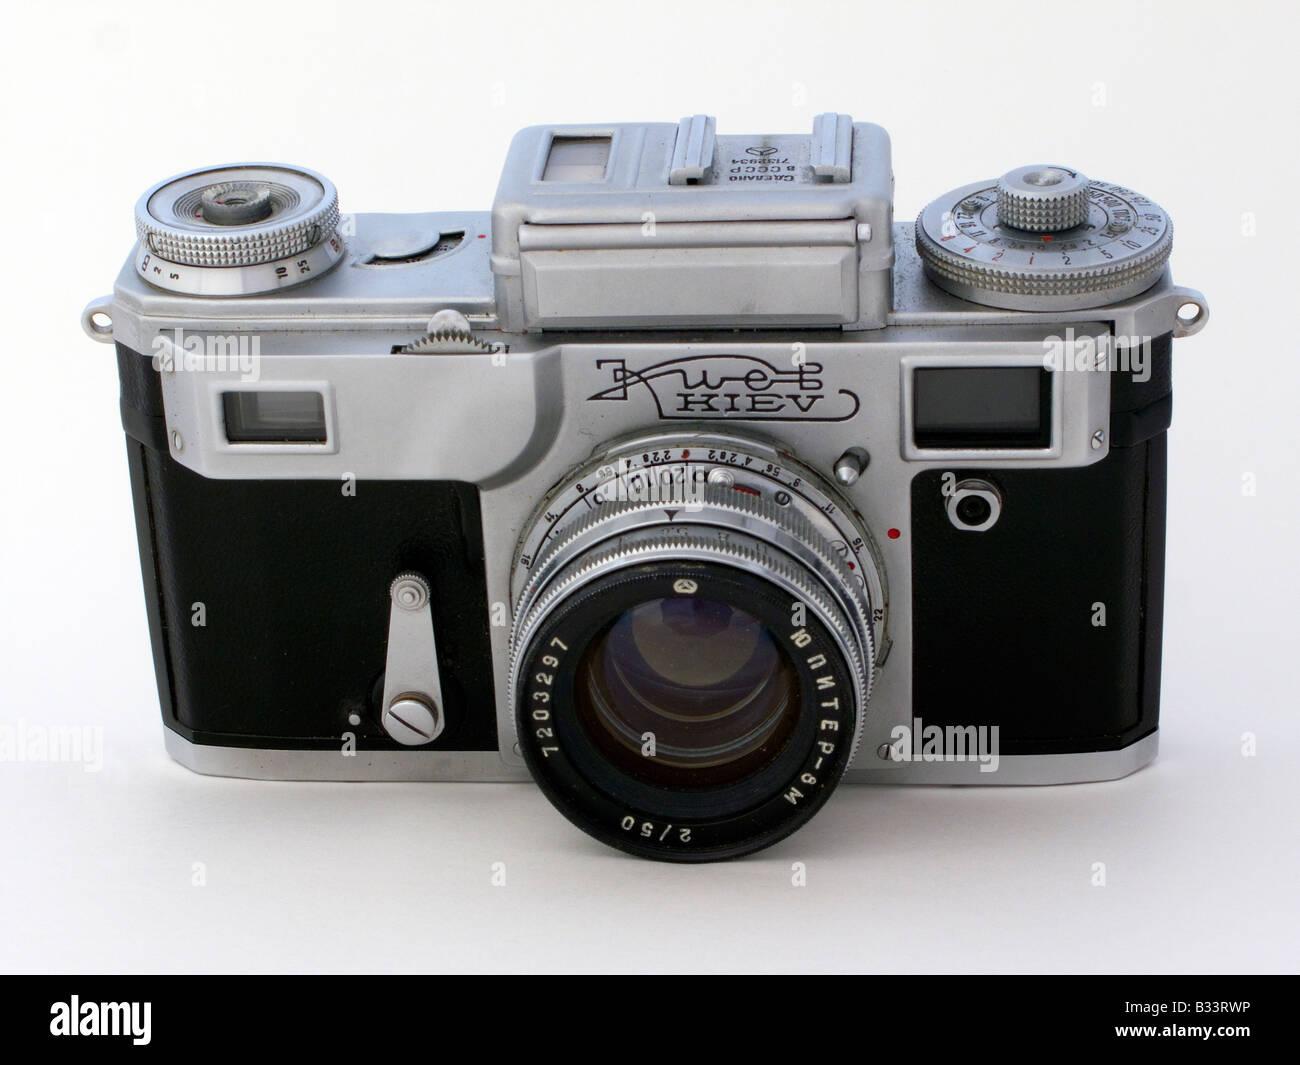 Dusted old Kiev 4 soviet era 35 mm film camera - Stock Image